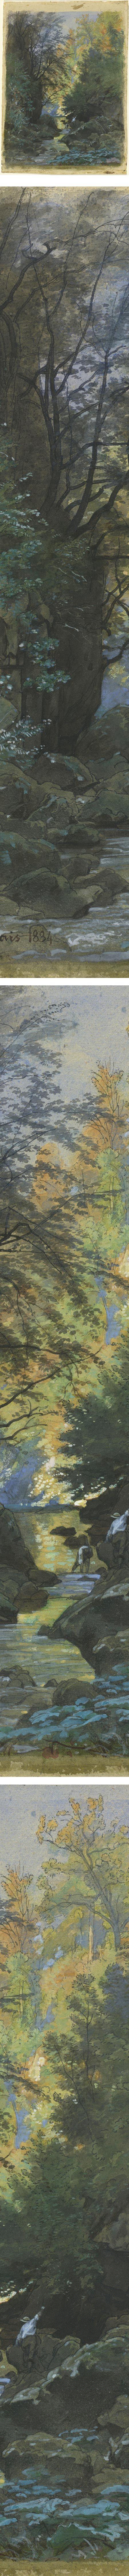 A Stream through a Dense Forest, Francois-Louis Francais, watercolor ...